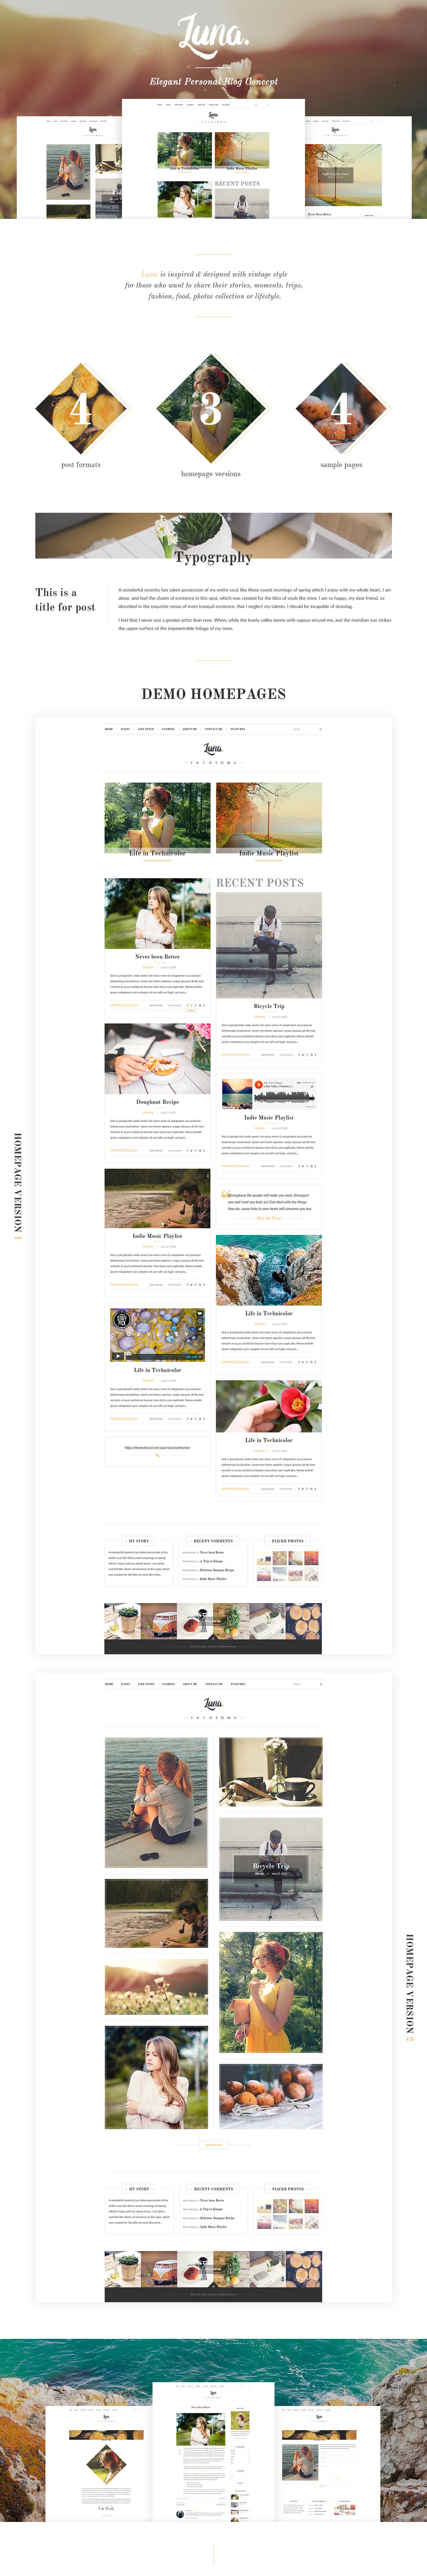 Blog elegant personal photoshop concept UI ux